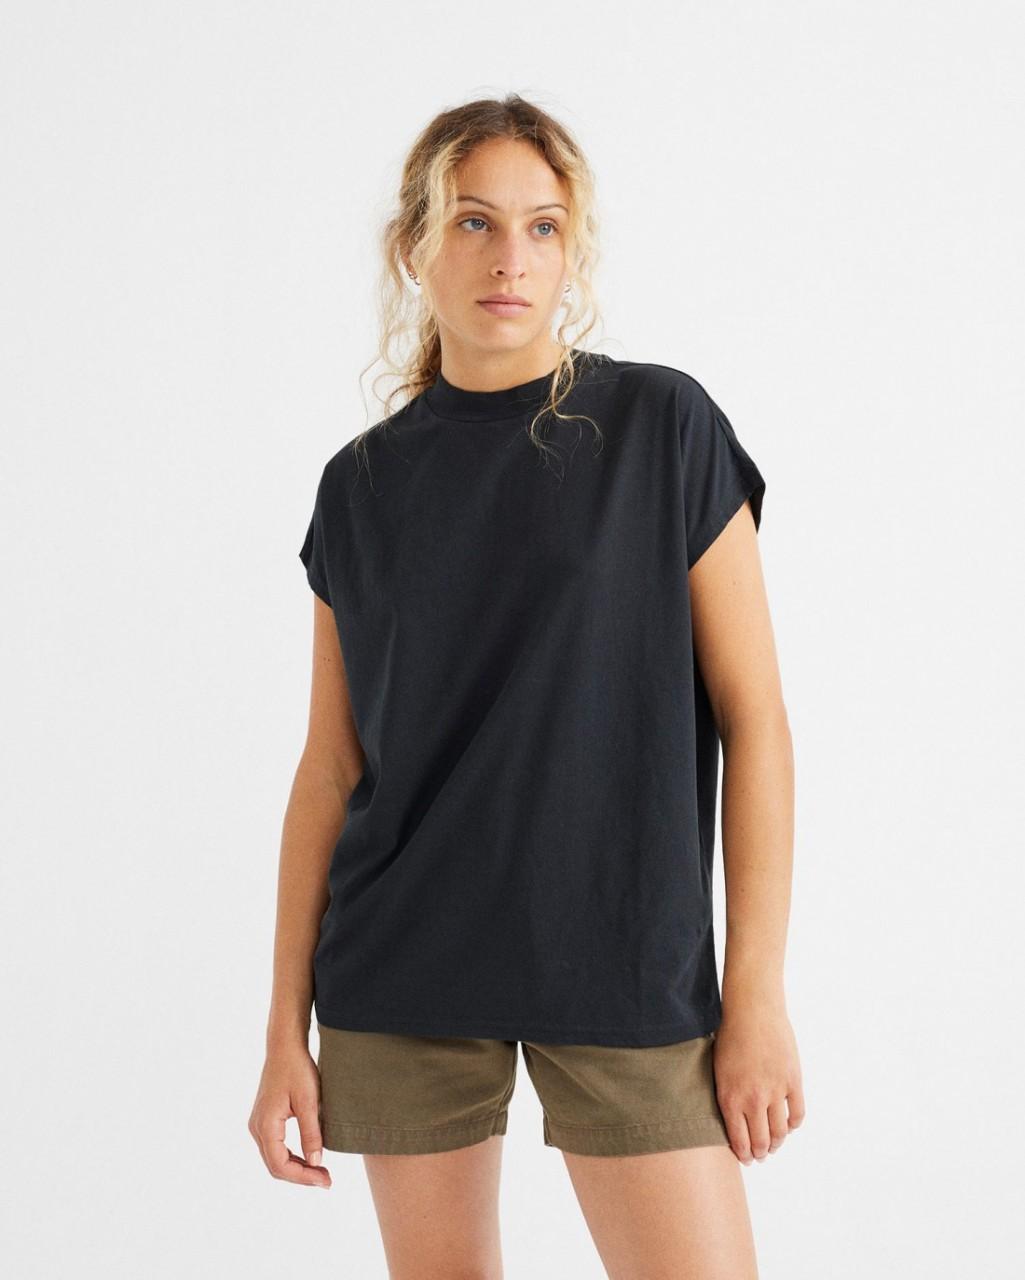 BASIC BLACK VOLTA T-SHIRT